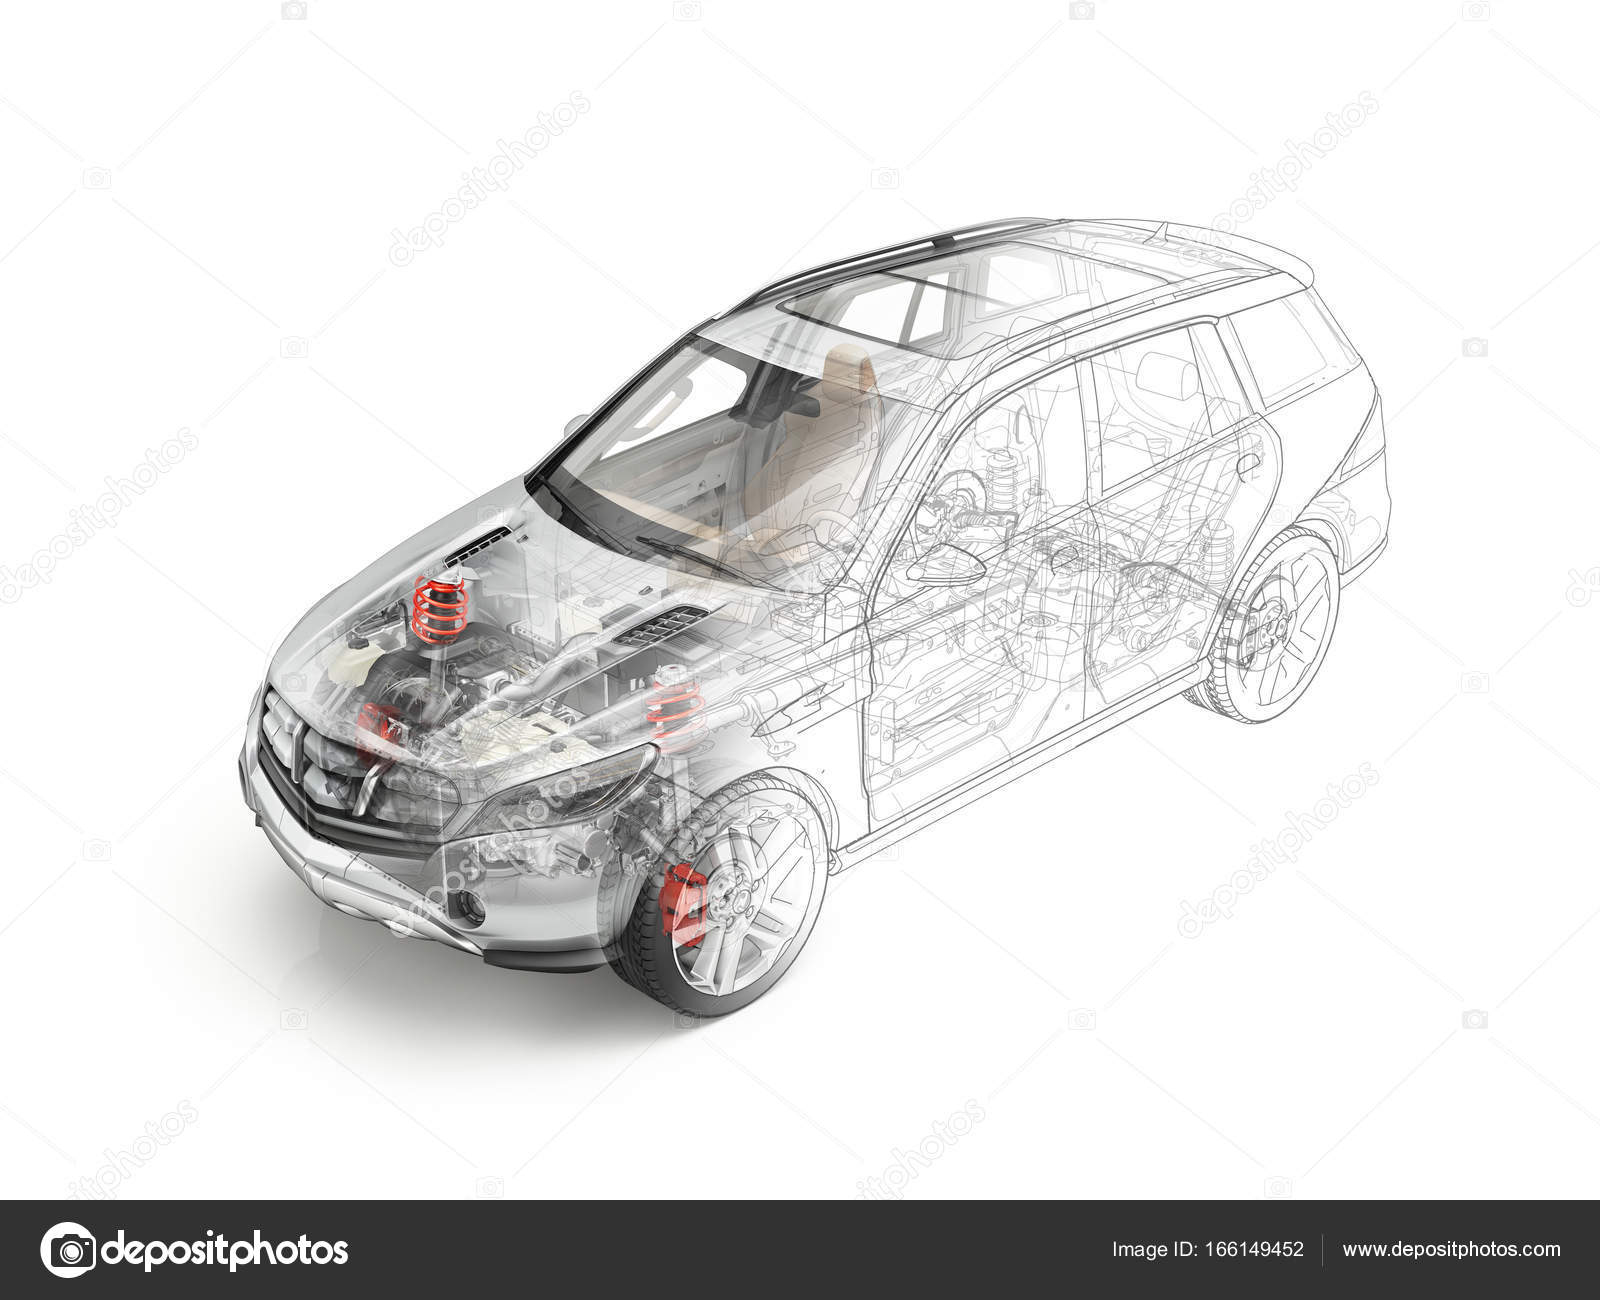 Suv voiture d taill e en coupe morphing au dessin r aliste - Voiture 3d dwg ...